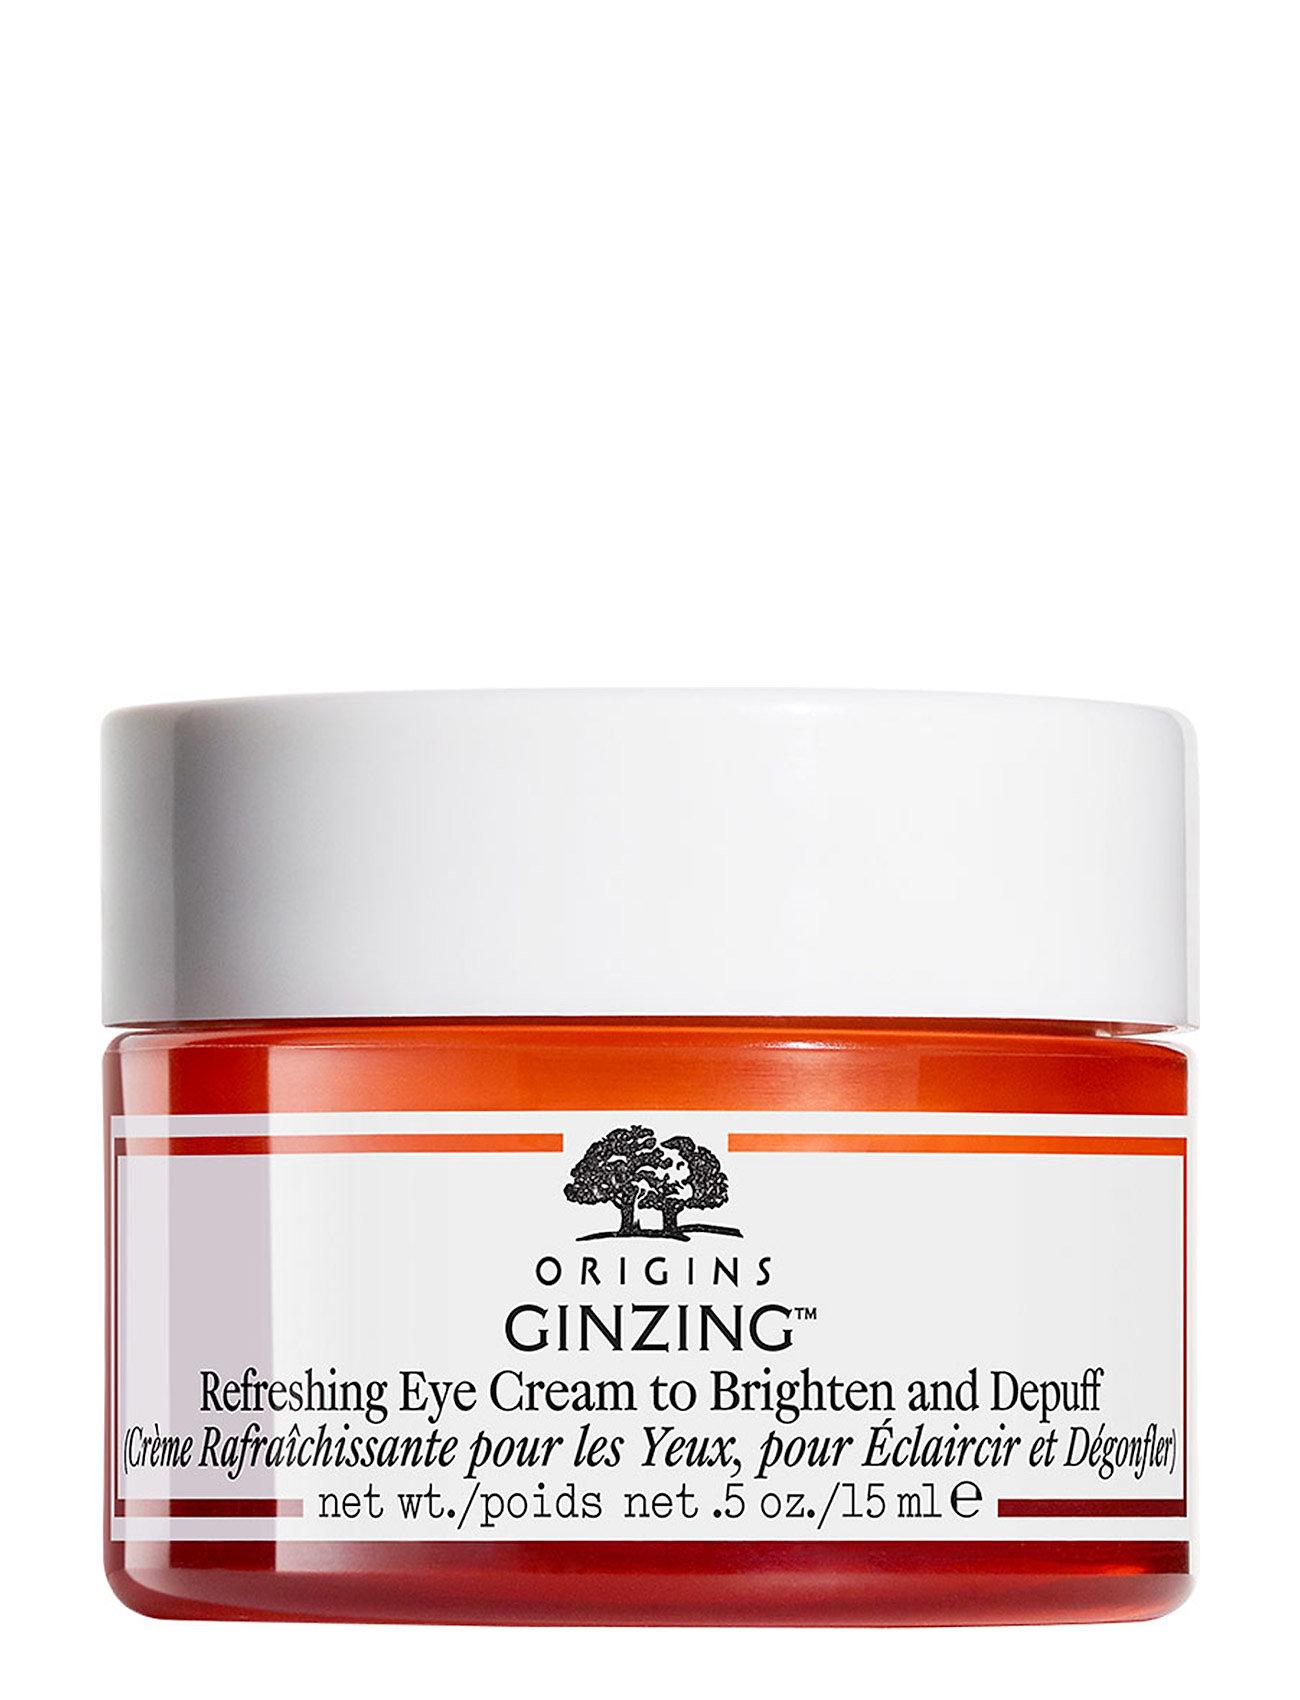 origins Ginzing™ refreshing eye cream på boozt.com dk